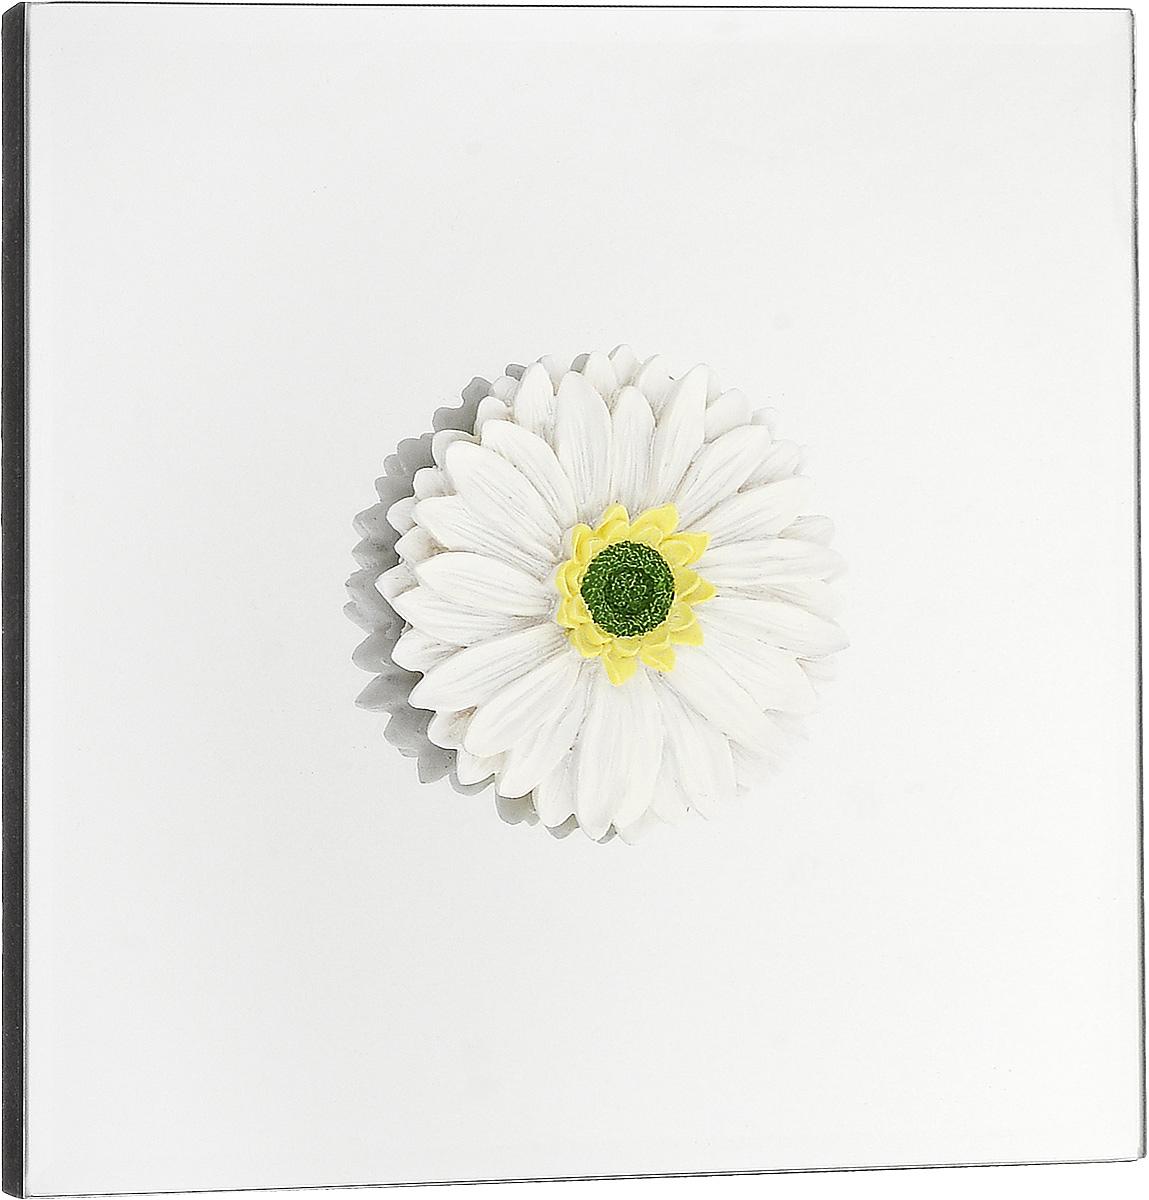 Украшение декоративное Феникс-Презент Гербера, настенное, 24 x 24 x 3 см феникс презент украшение варежка 14 см